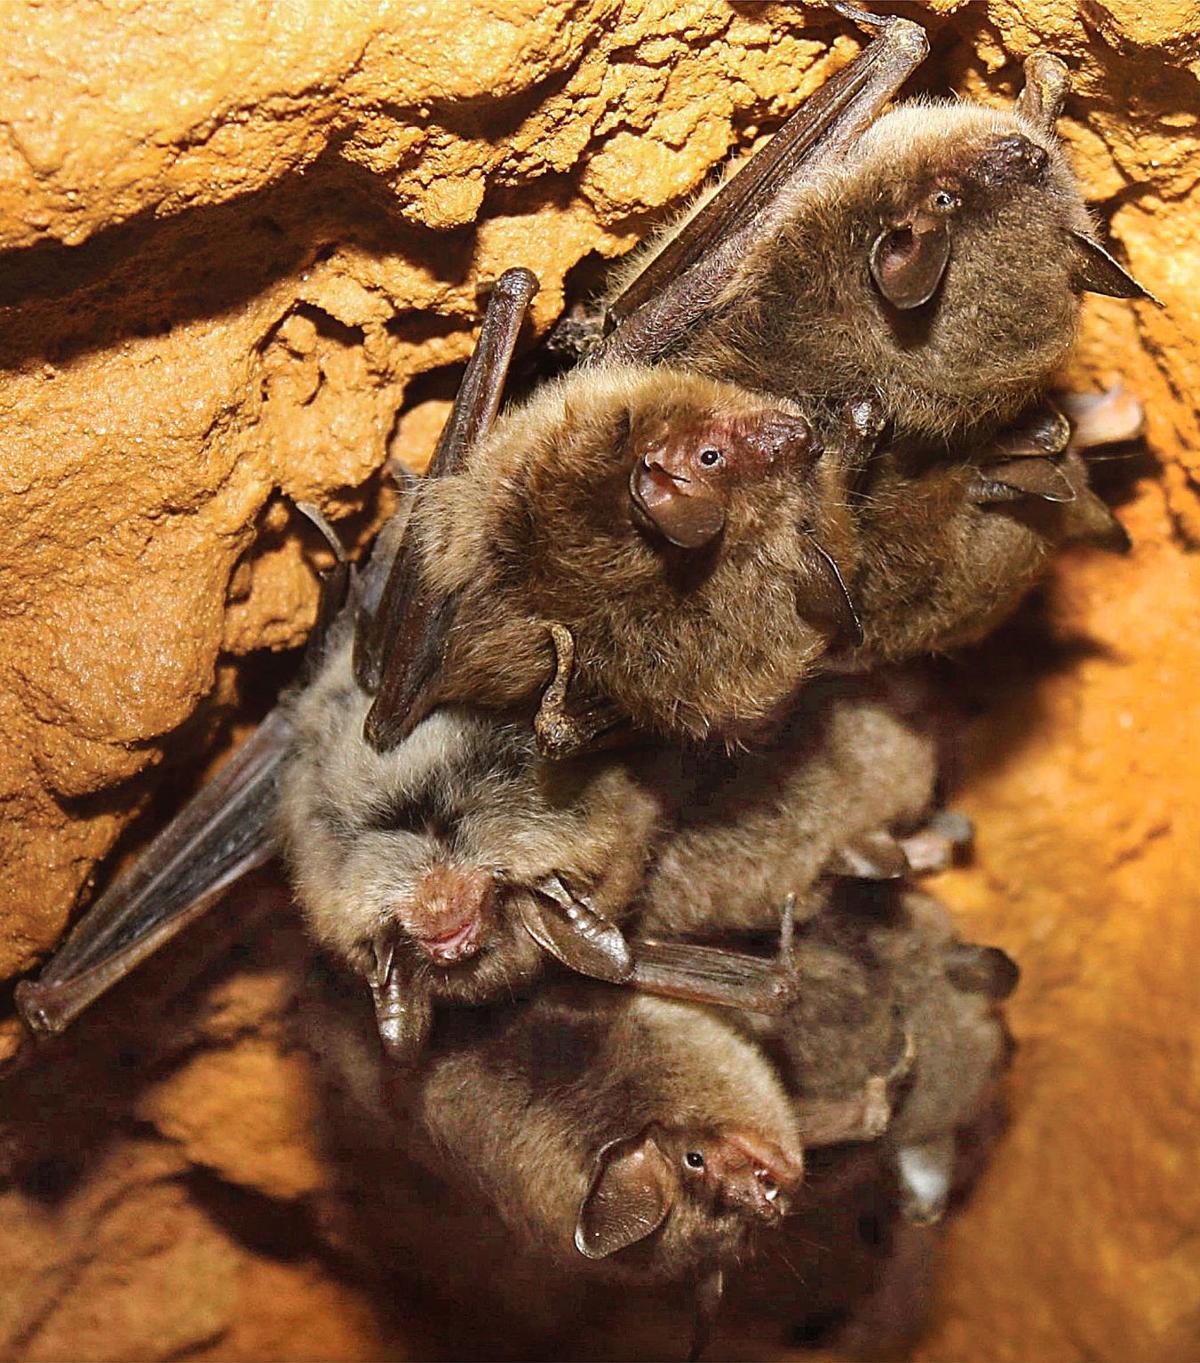 con_Bats_1_052618